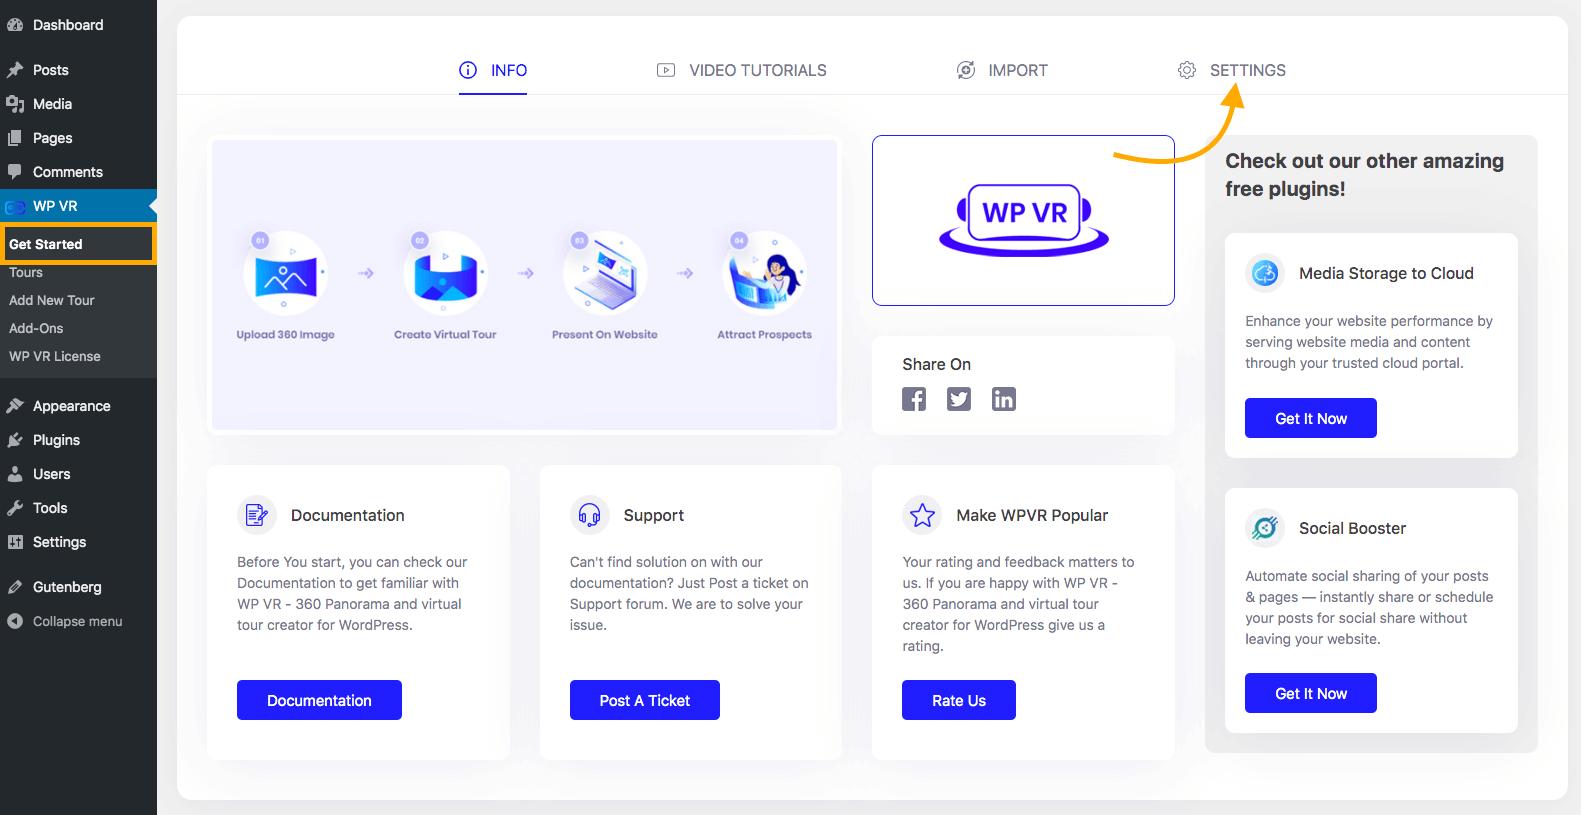 WPVR Get Started Page